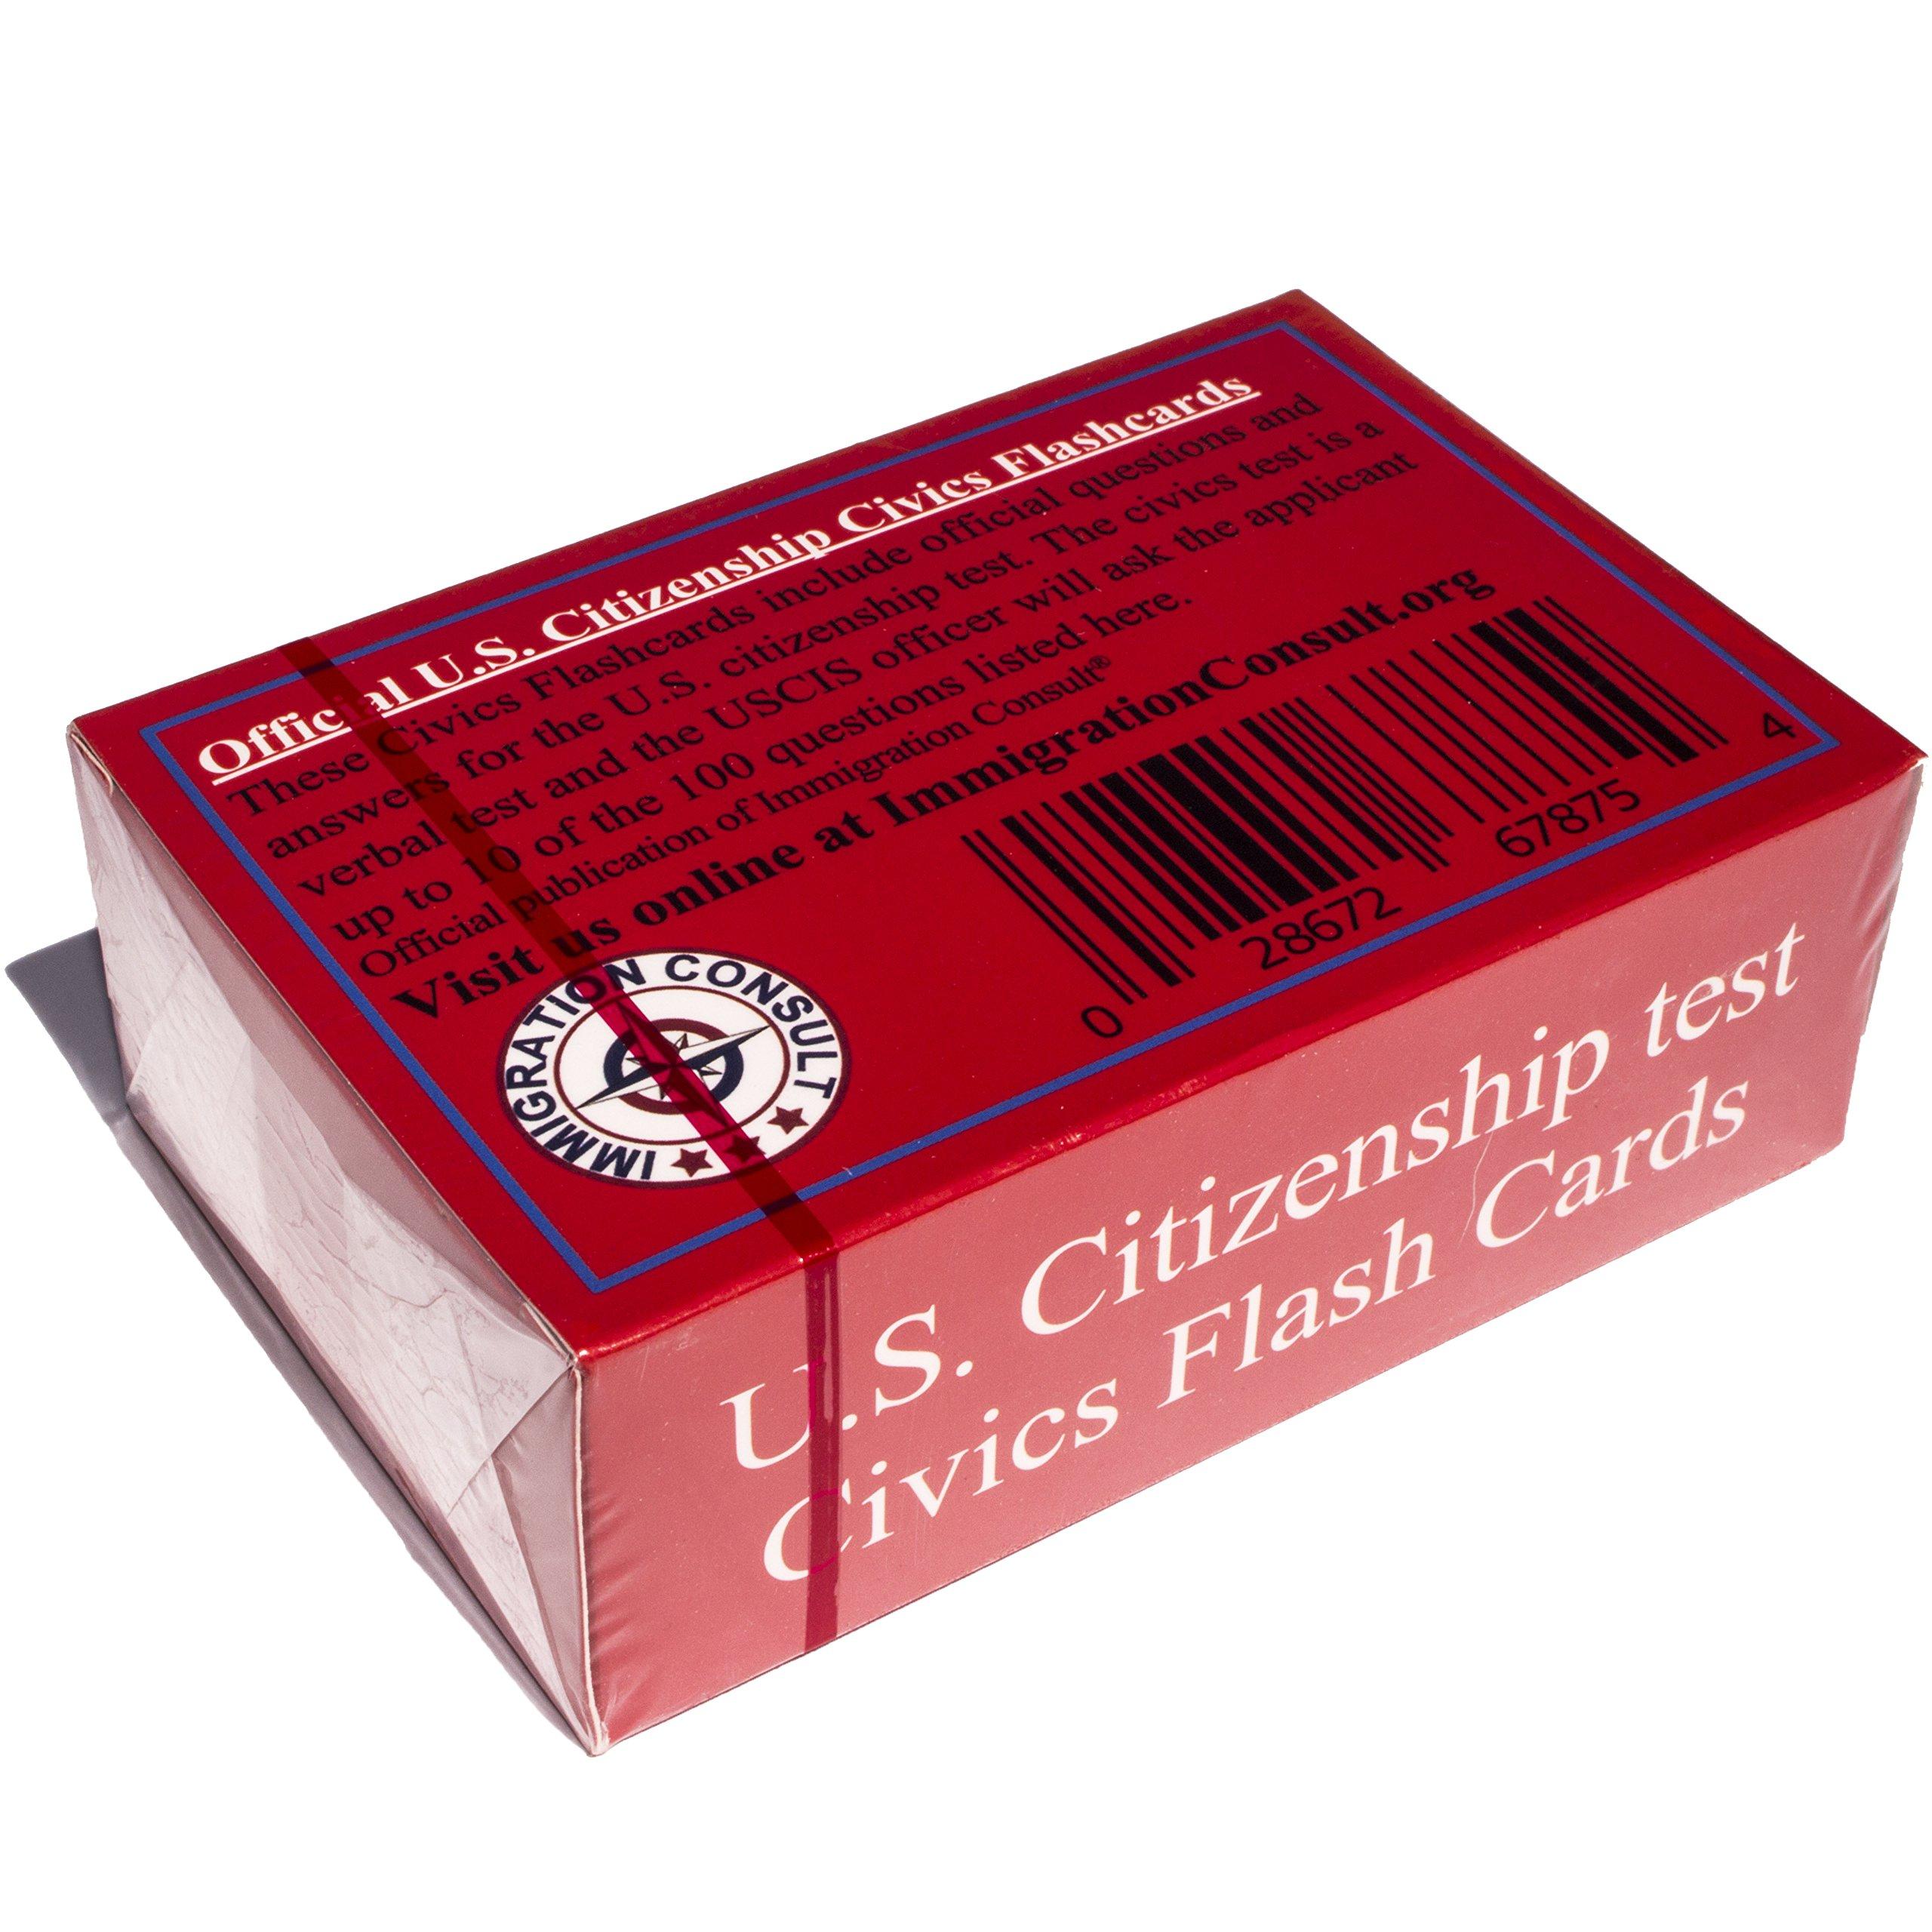 Amazon.com: US Citizenship test civics flash cards for the ...